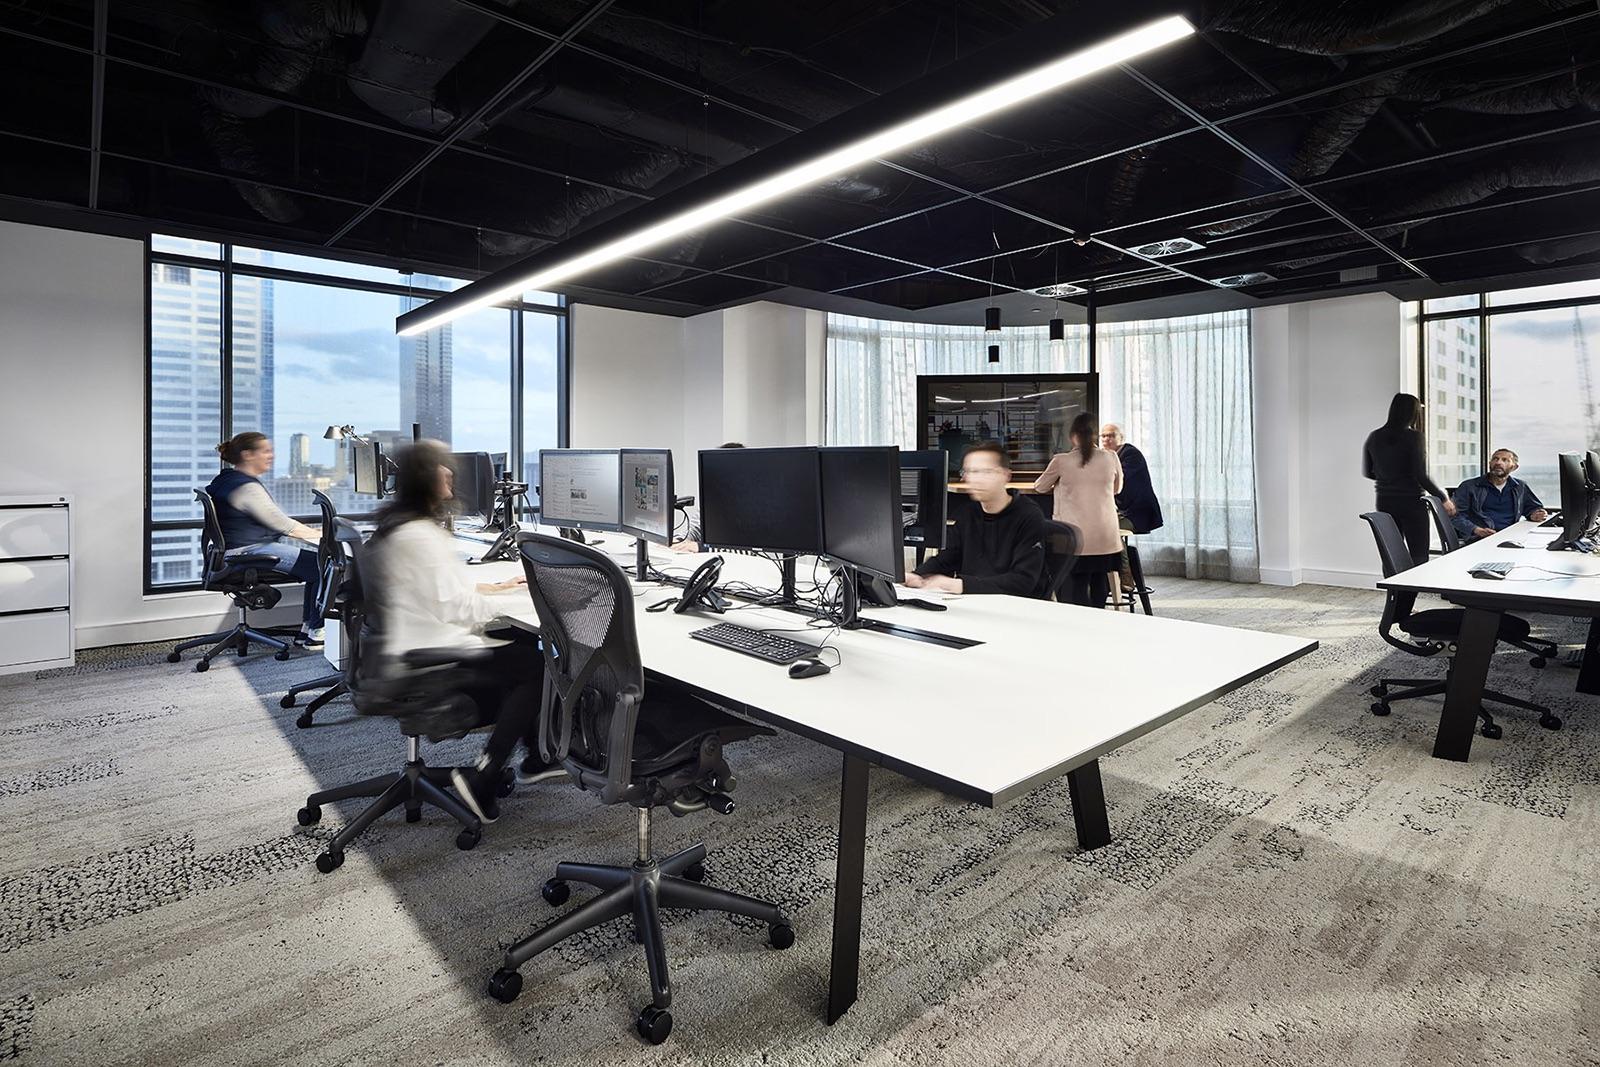 blp-melbourne-office-11